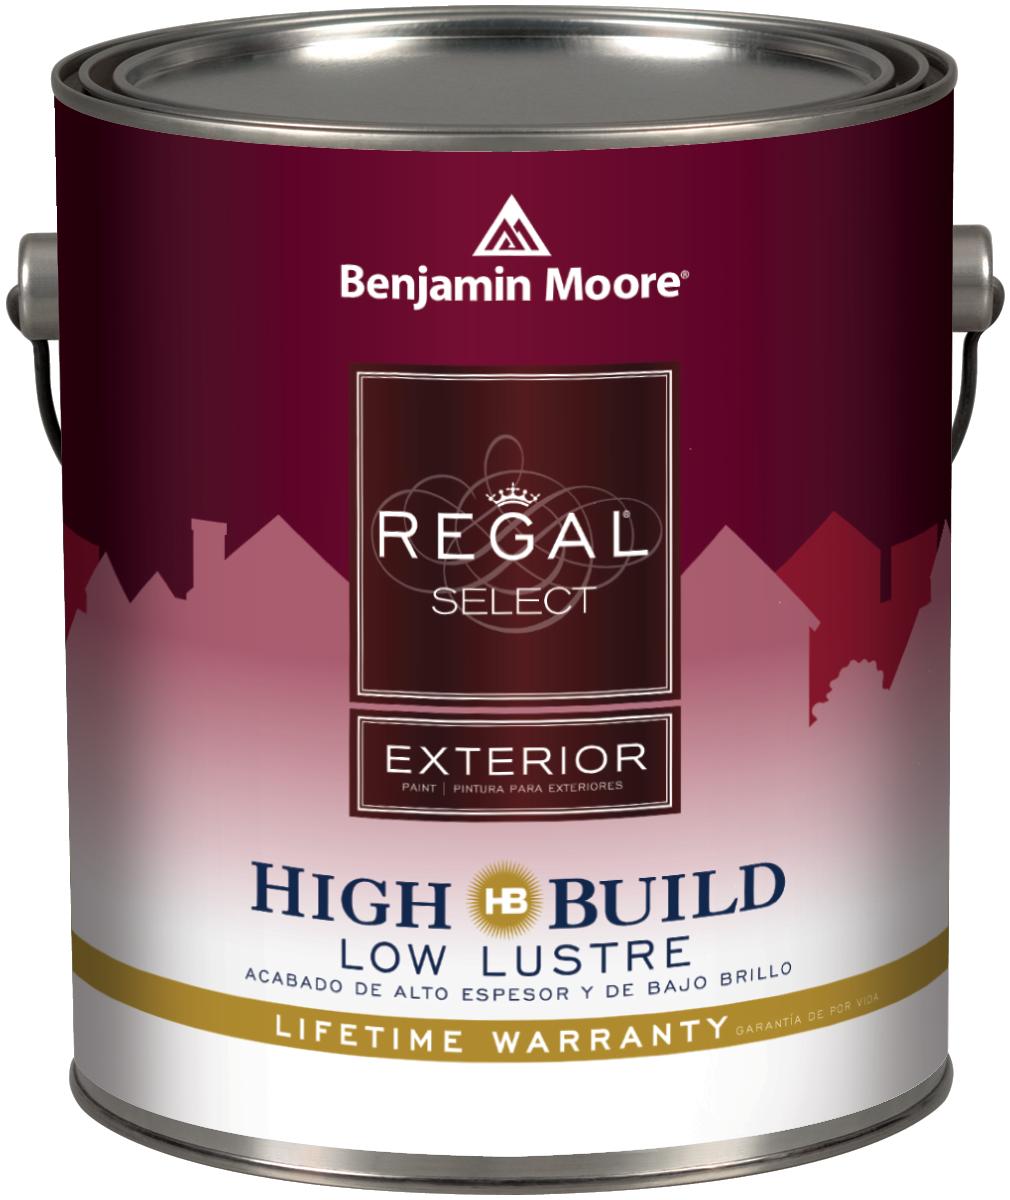 Benjamin Moore Regal Select Exterior High Build Flat Finish 400 Thybony Paint Supplies